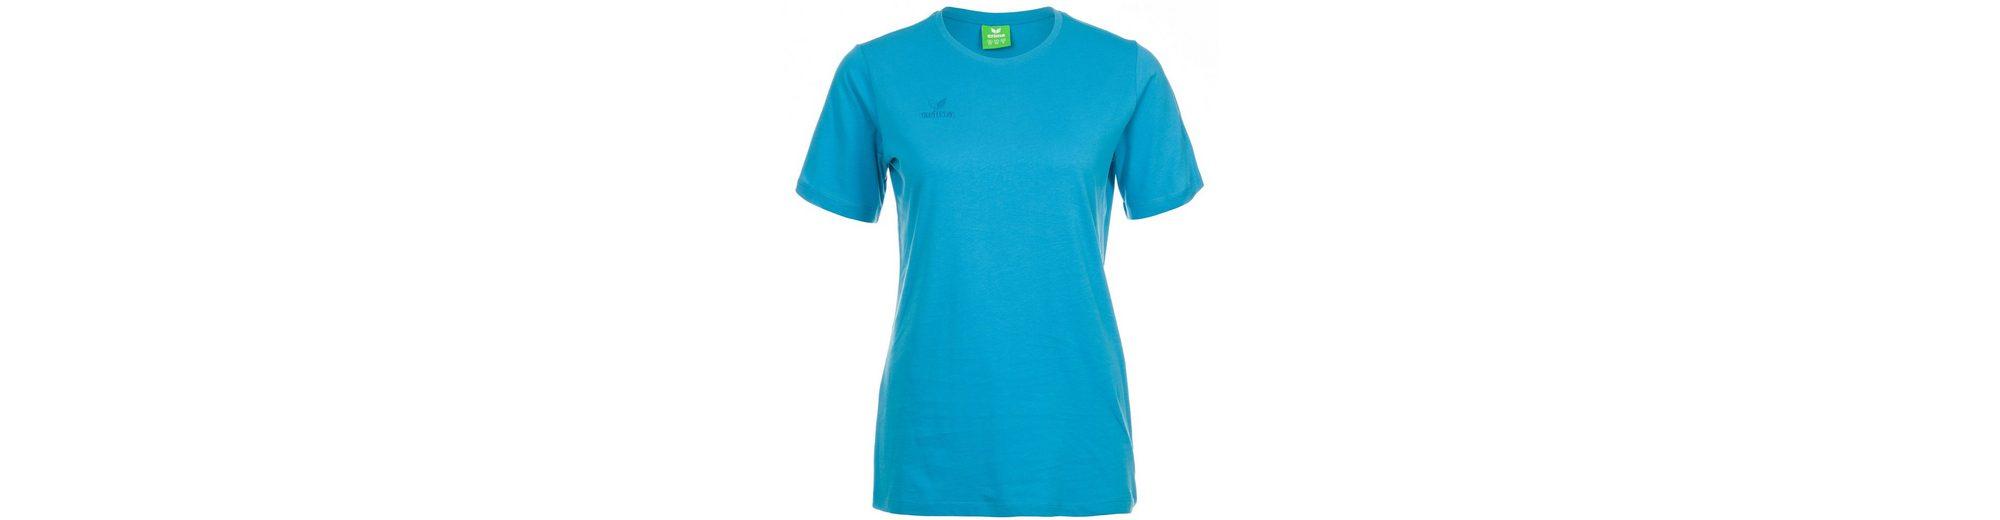 Outlet Mode-Stil ERIMA Teamsport T-Shirt Herren Neue Online lOTsBc